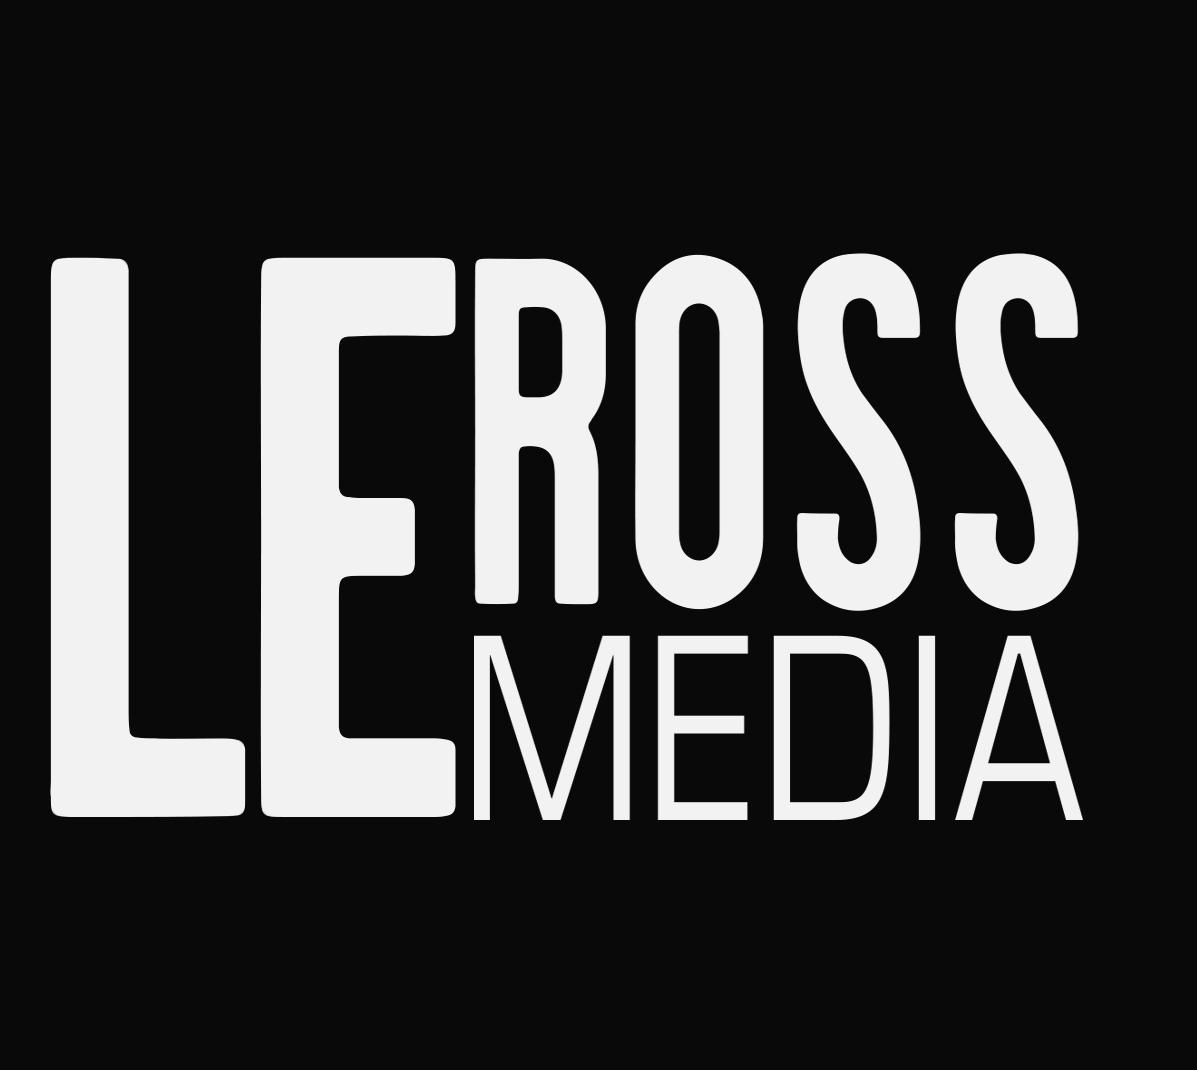 LeRoss Media